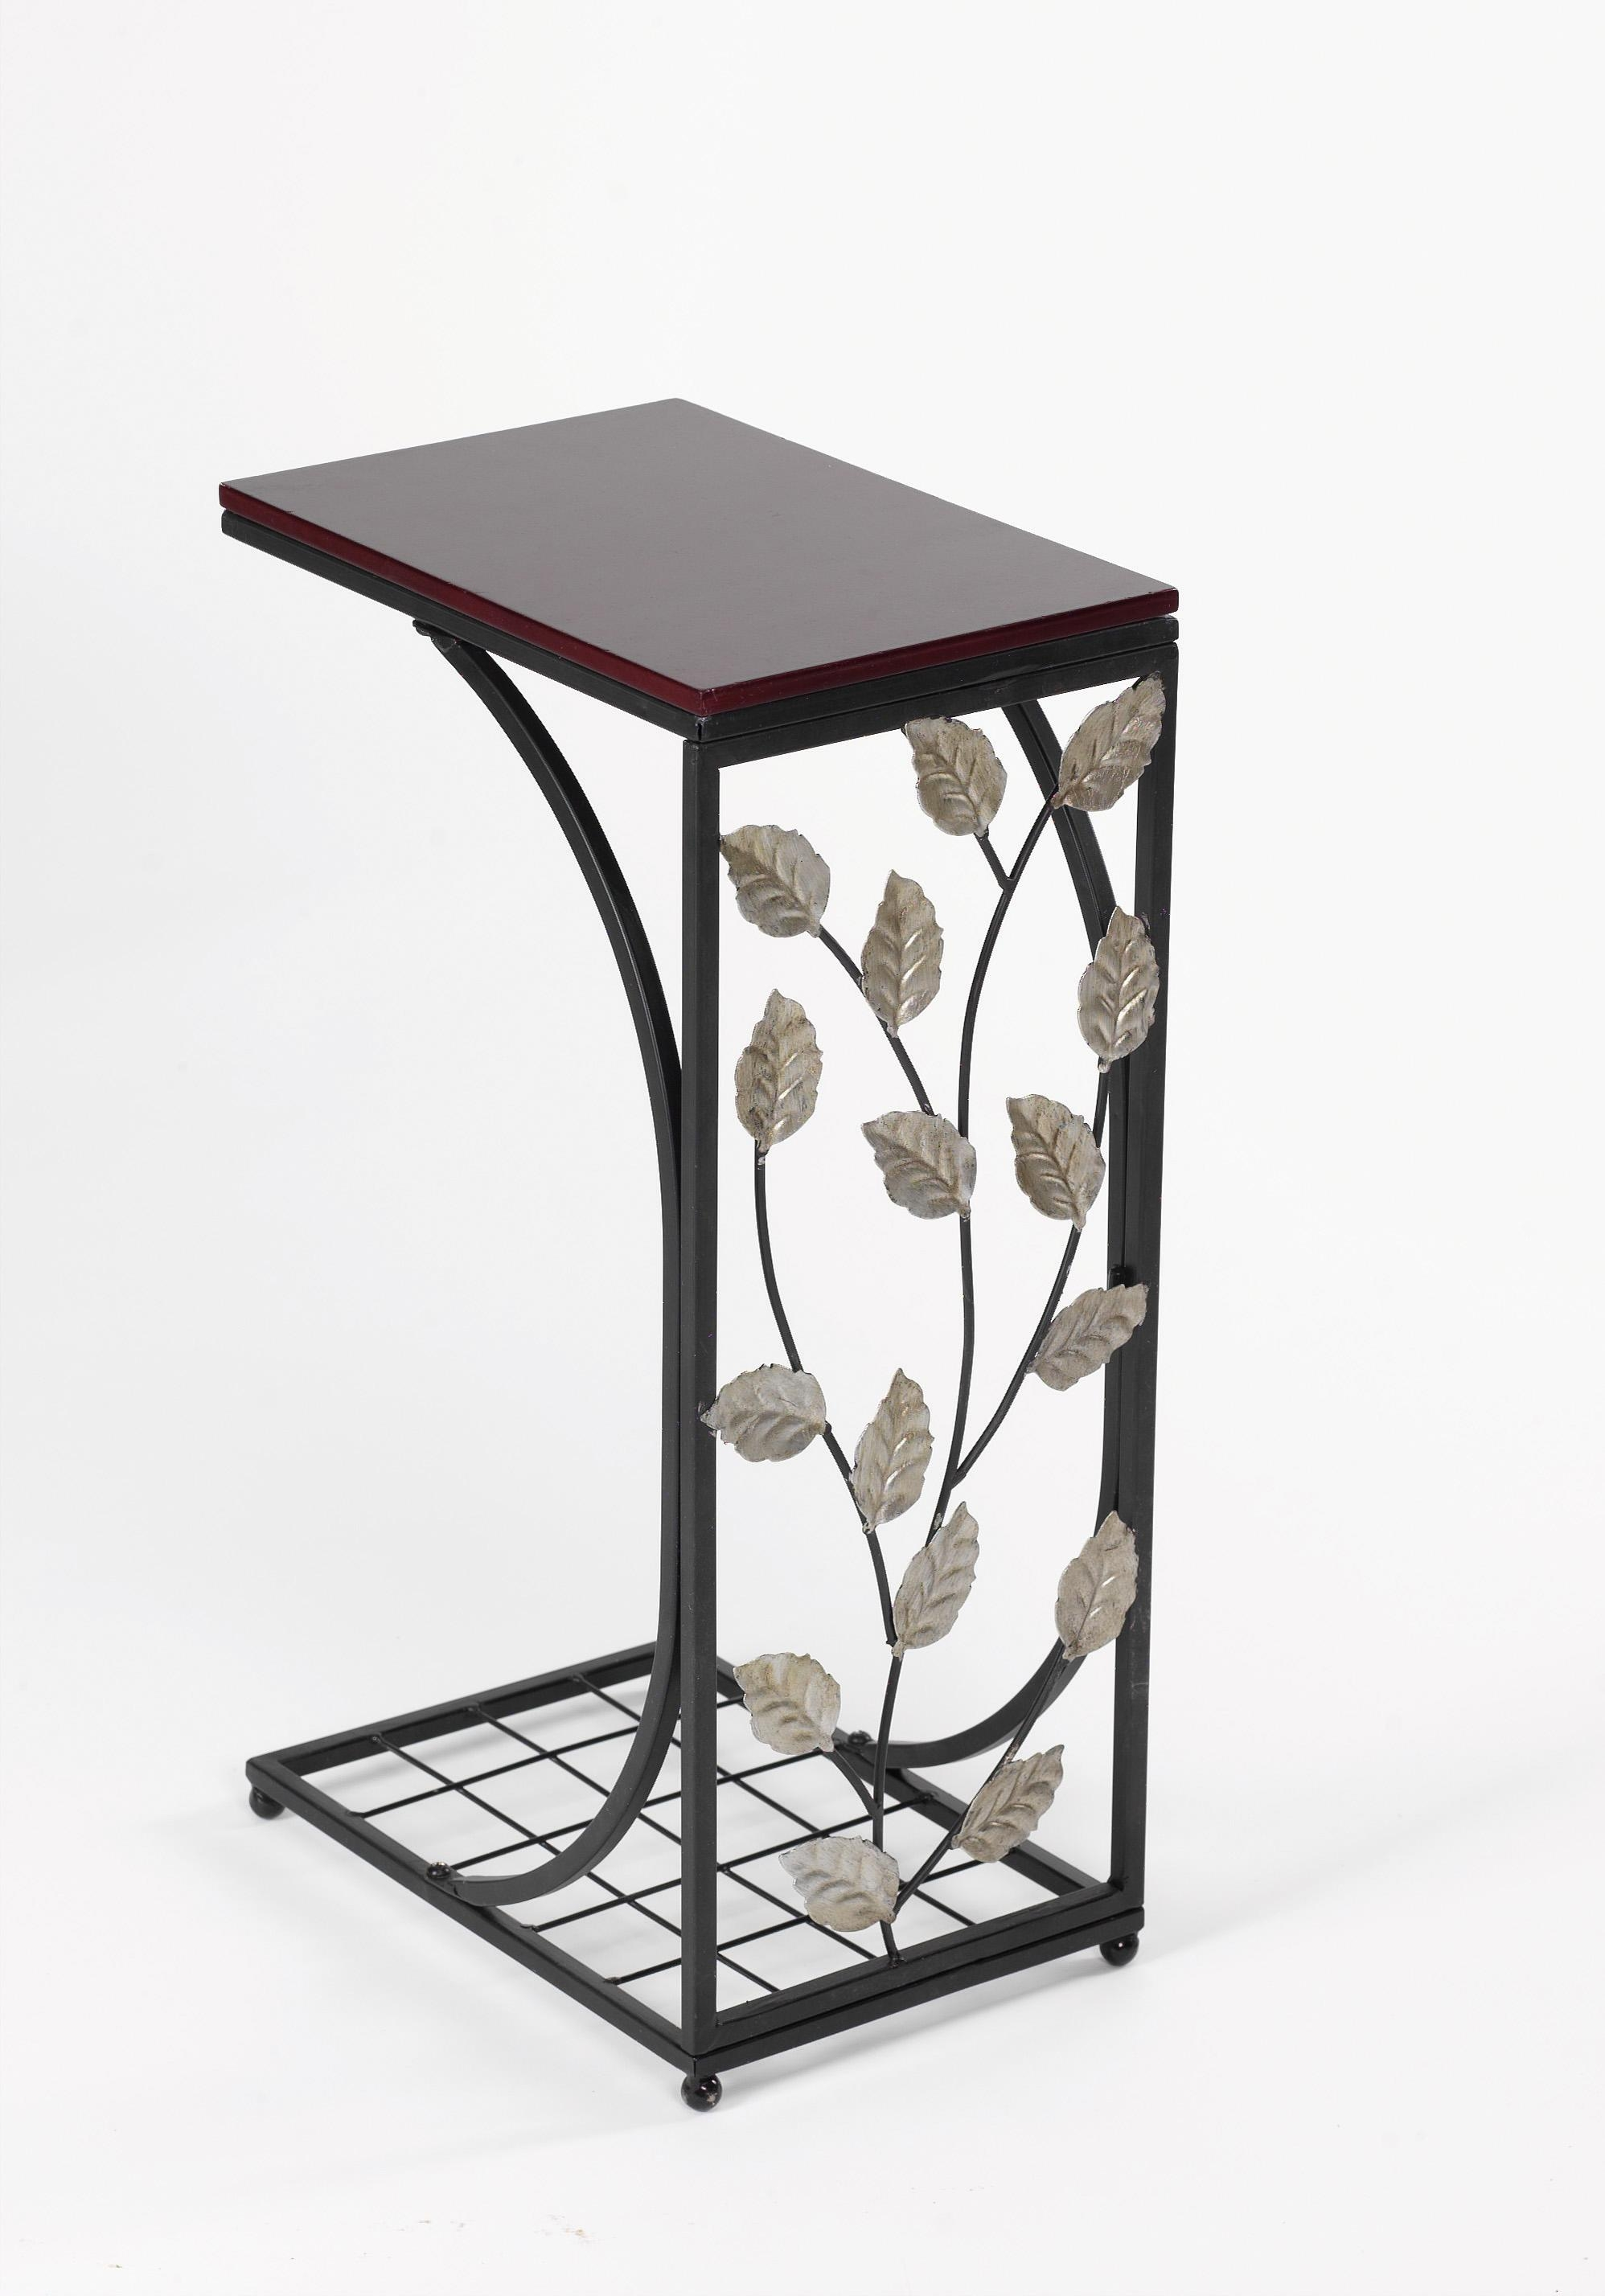 Narrow Sofa Table Uk | Tehranmix Decoration With Regard To Slim Sofa Tables (Image 12 of 20)